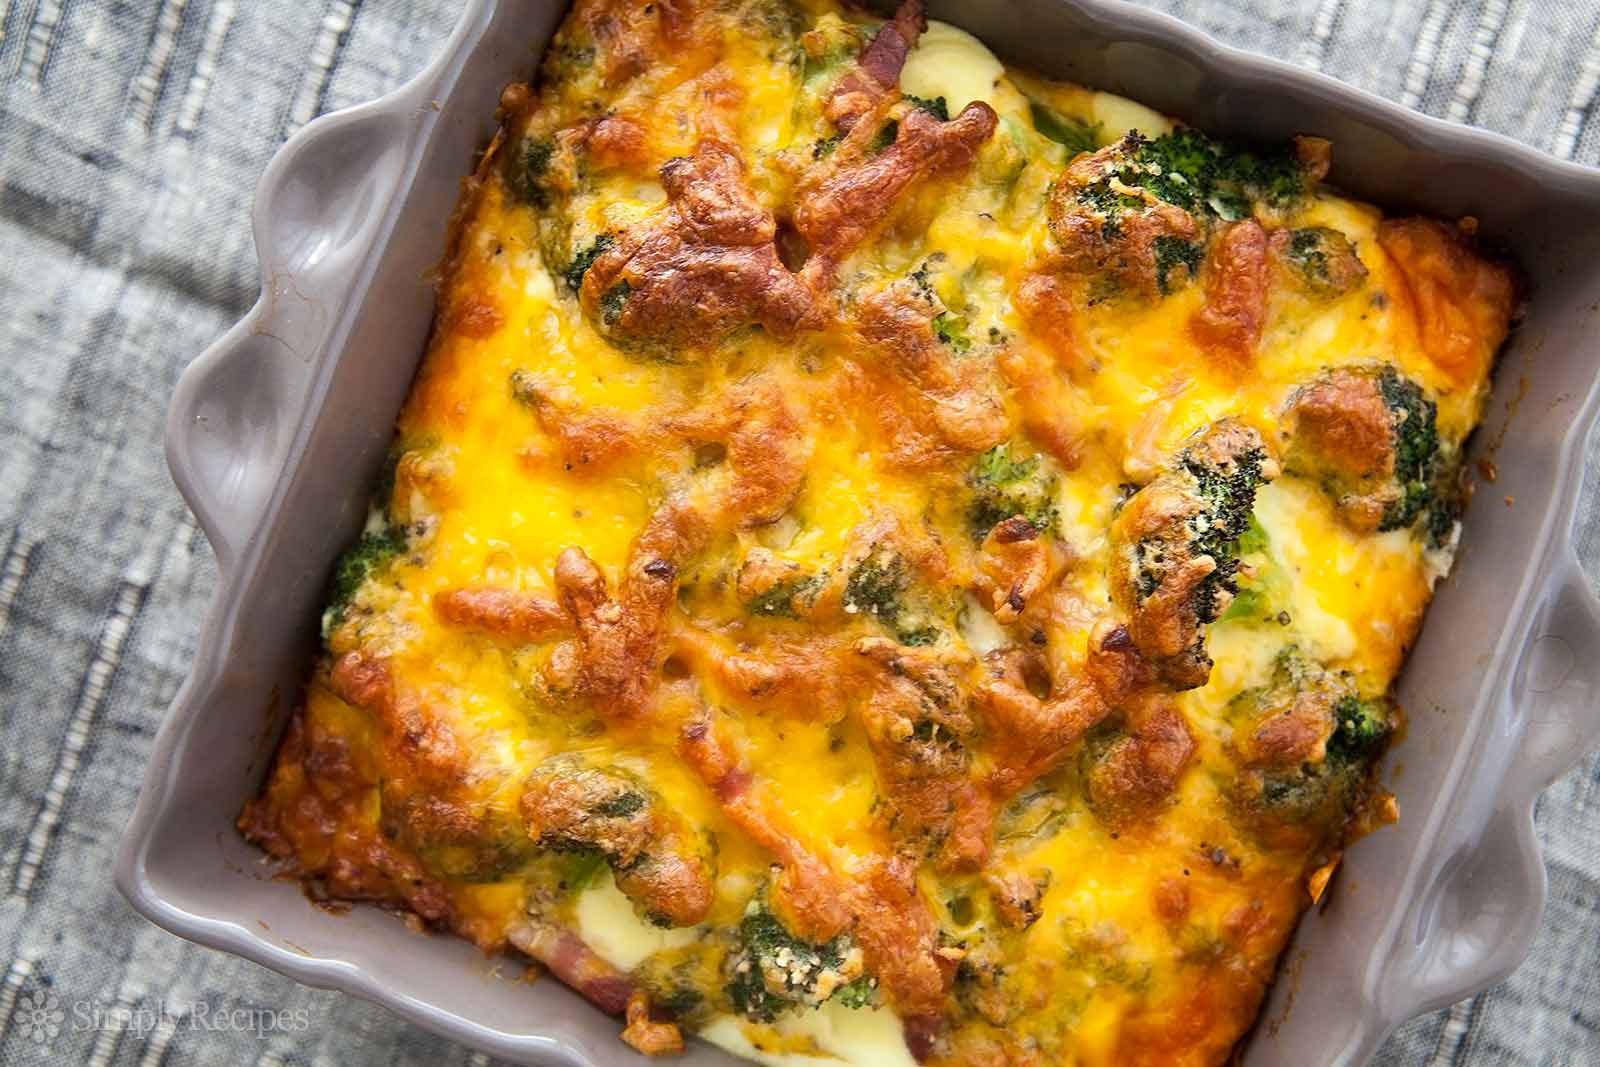 Broccoli Casserole Recipes  Broccoli Cheese Casserole Best EVER